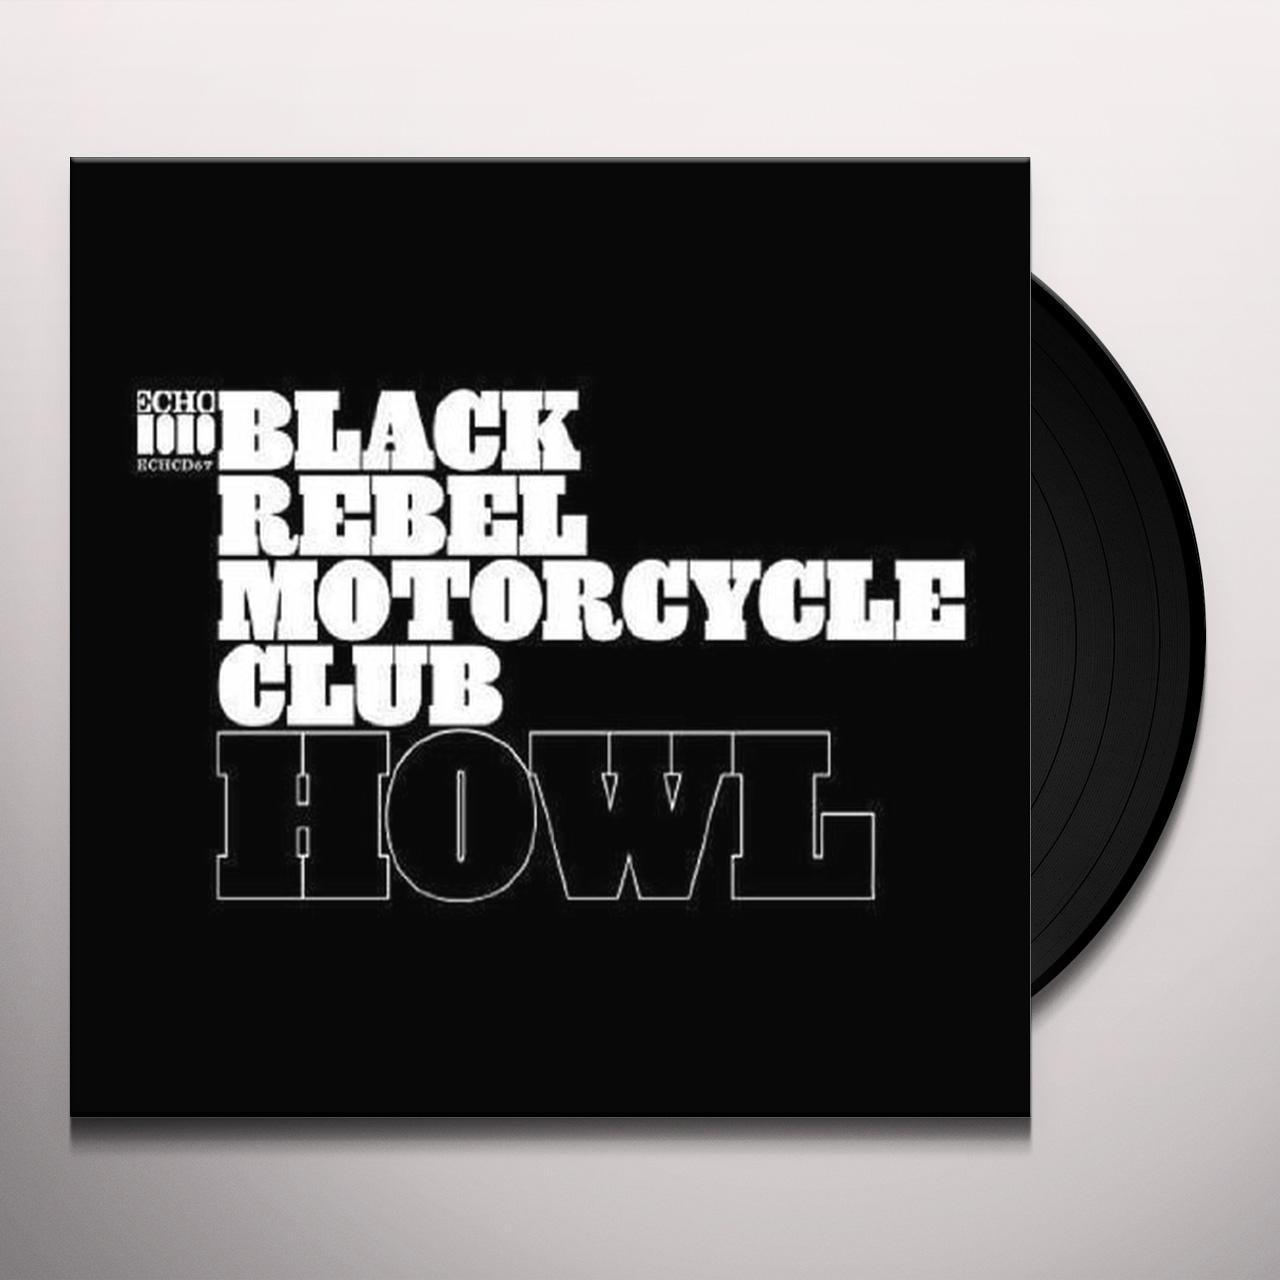 T shirt black rebel motorcycle club - Black Rebel Motorcycle Club Howl Vinyl Record Hover To Zoom